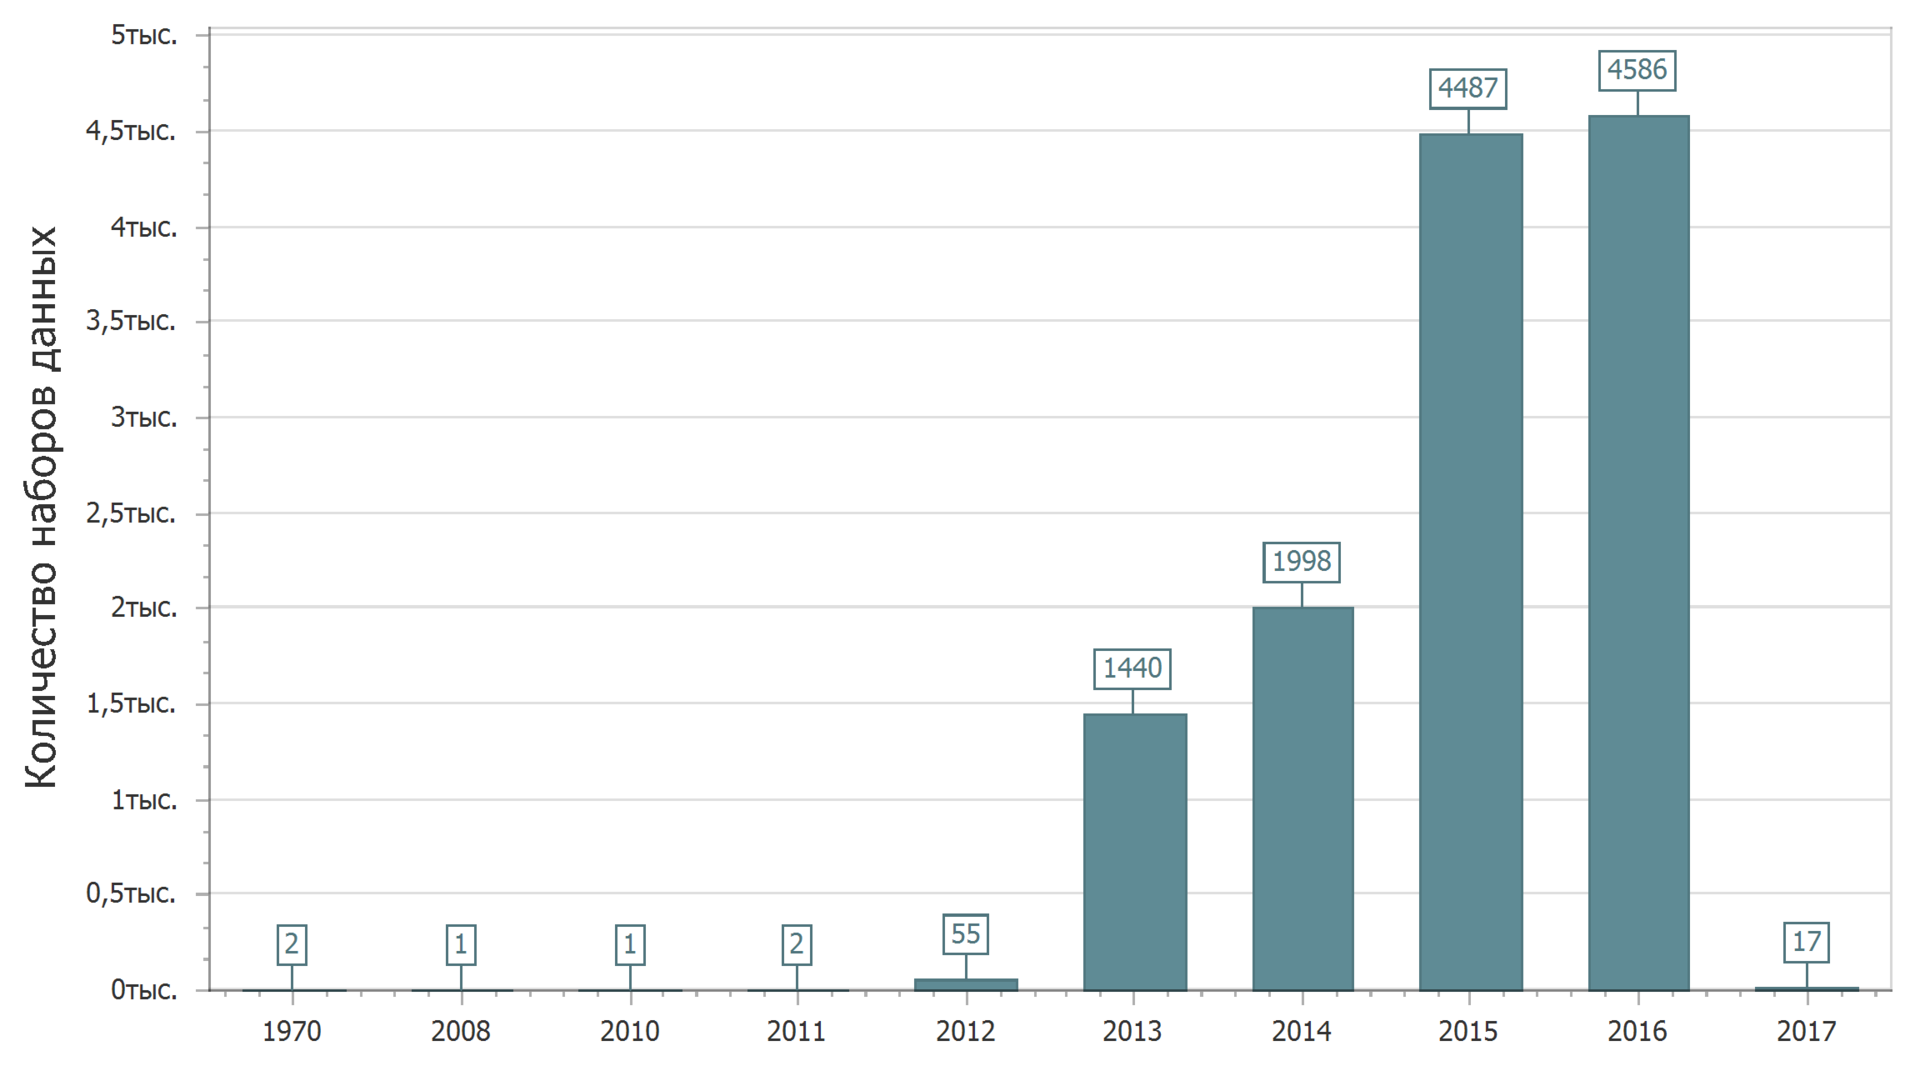 Анализ наборов данных с портала открытых данных data.gov.ru - 2